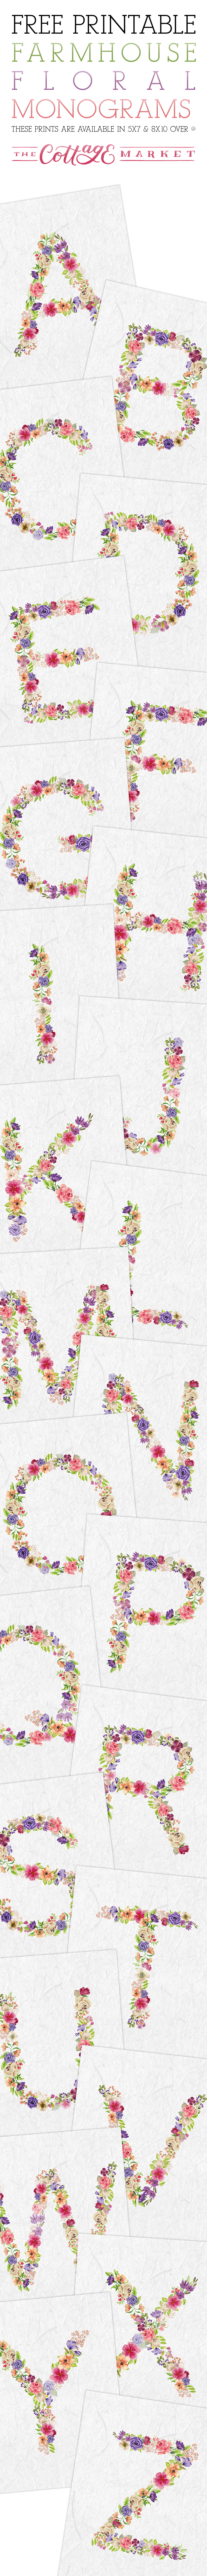 http://thecottagemarket.com/wp-content/uploads/2017/08/TCM-Floral-Monogram-TOWER-1.jpg